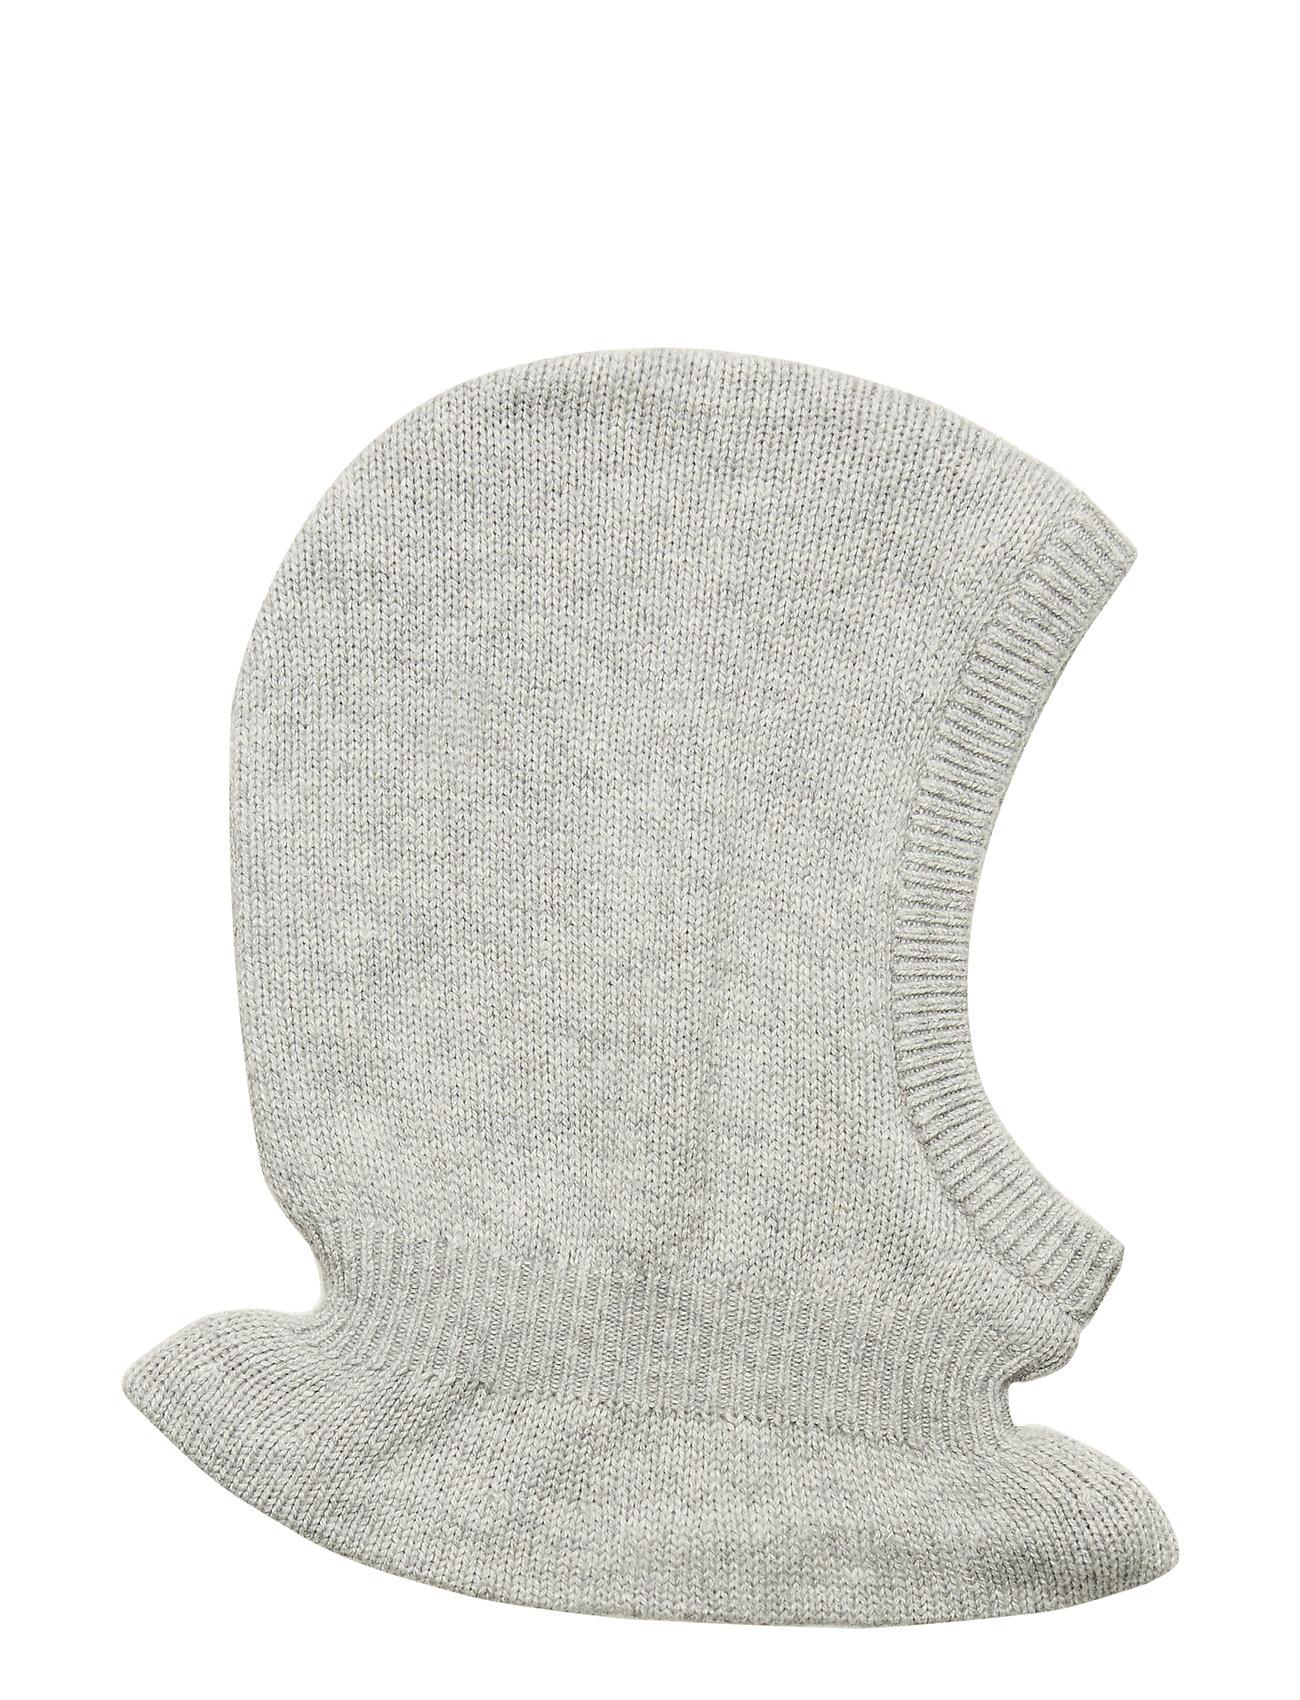 Wheat Knitted Balaclava - MELANGE GREY